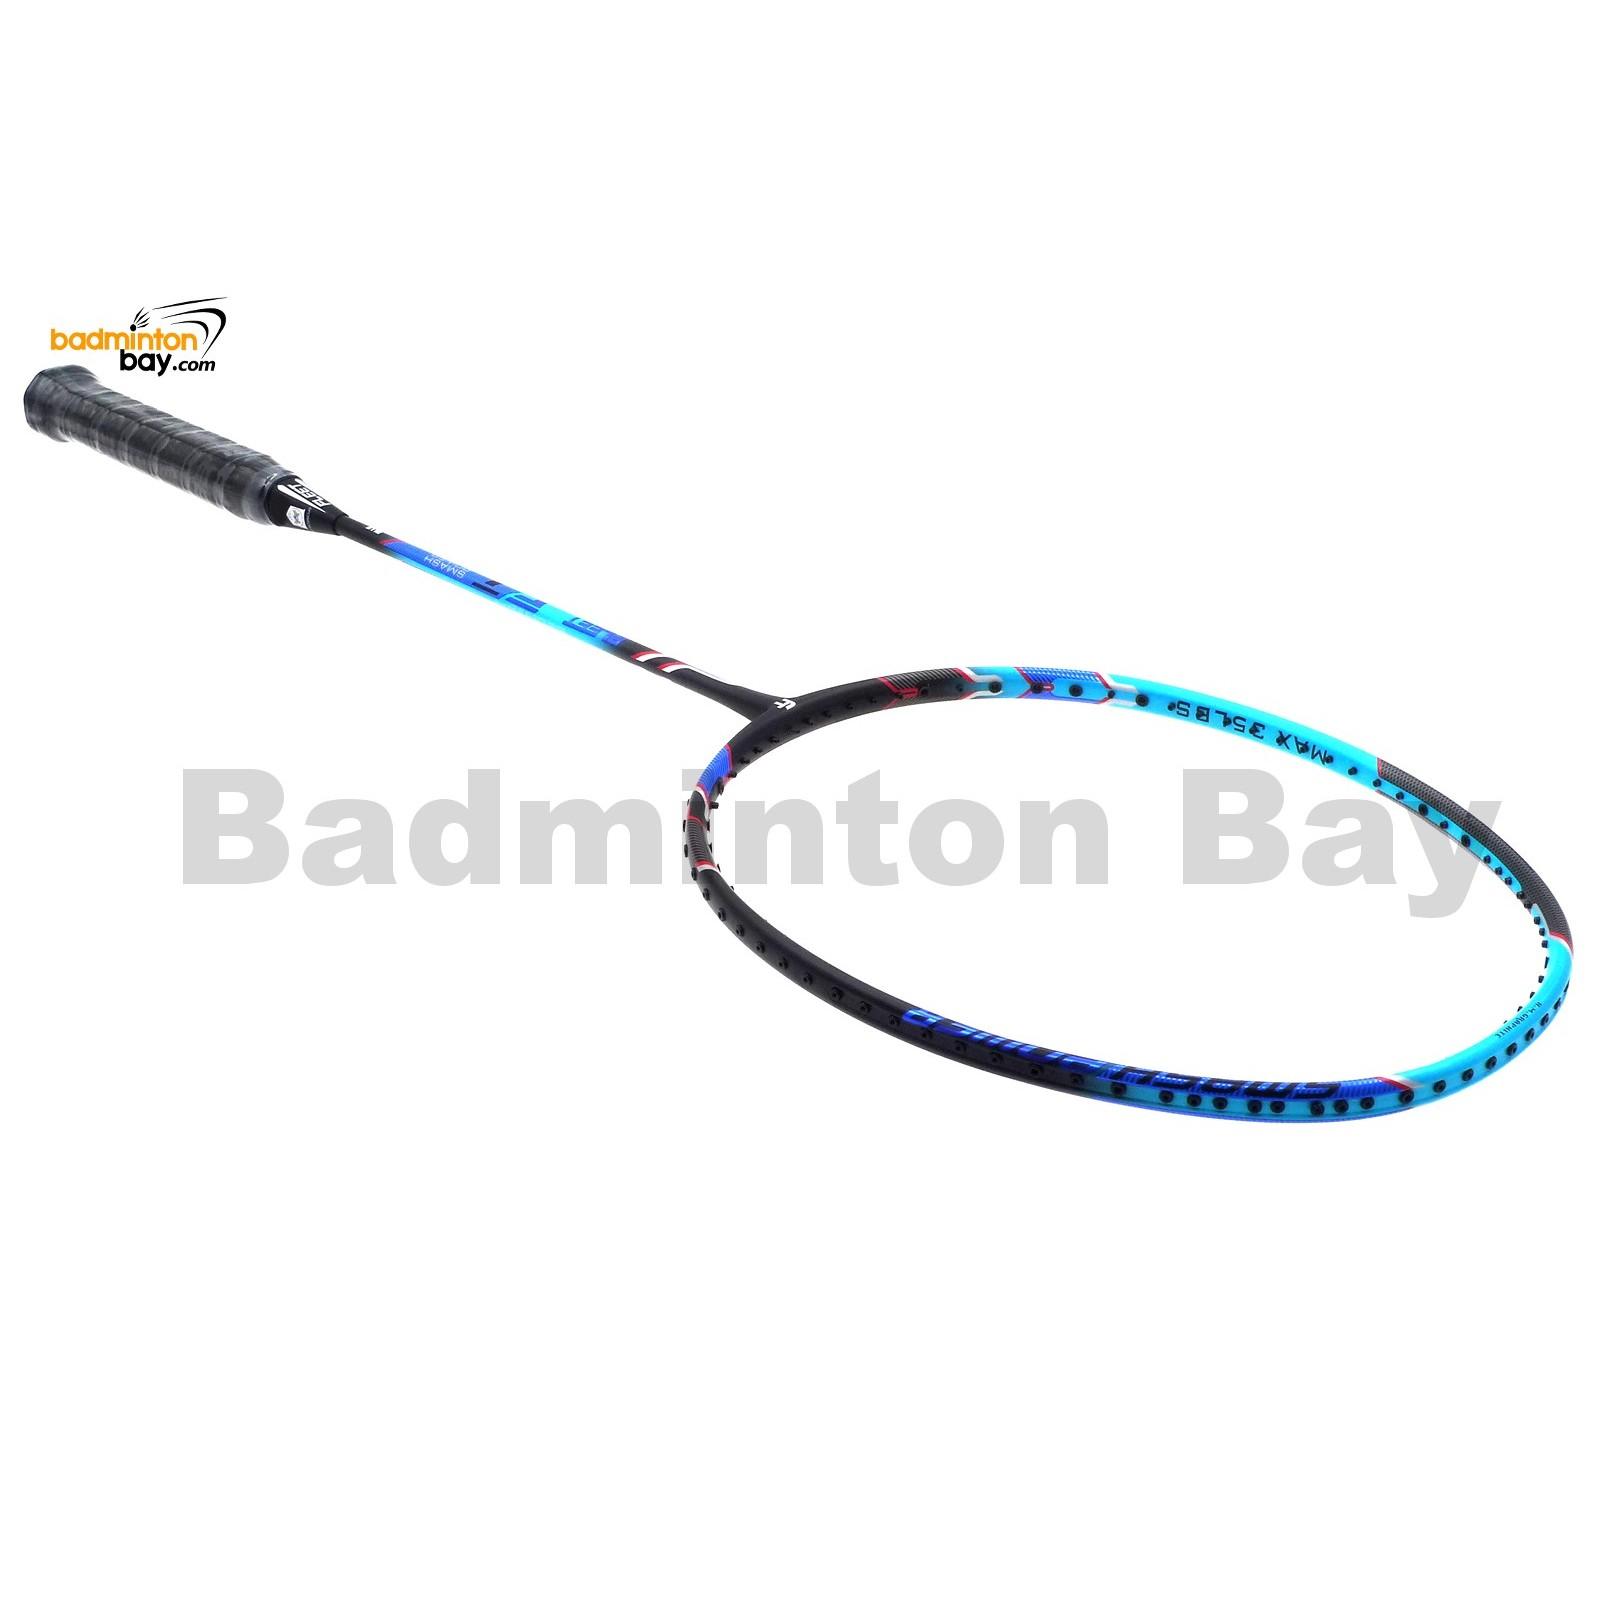 Fleet Smash Power Blue Badminton Racket (3U)